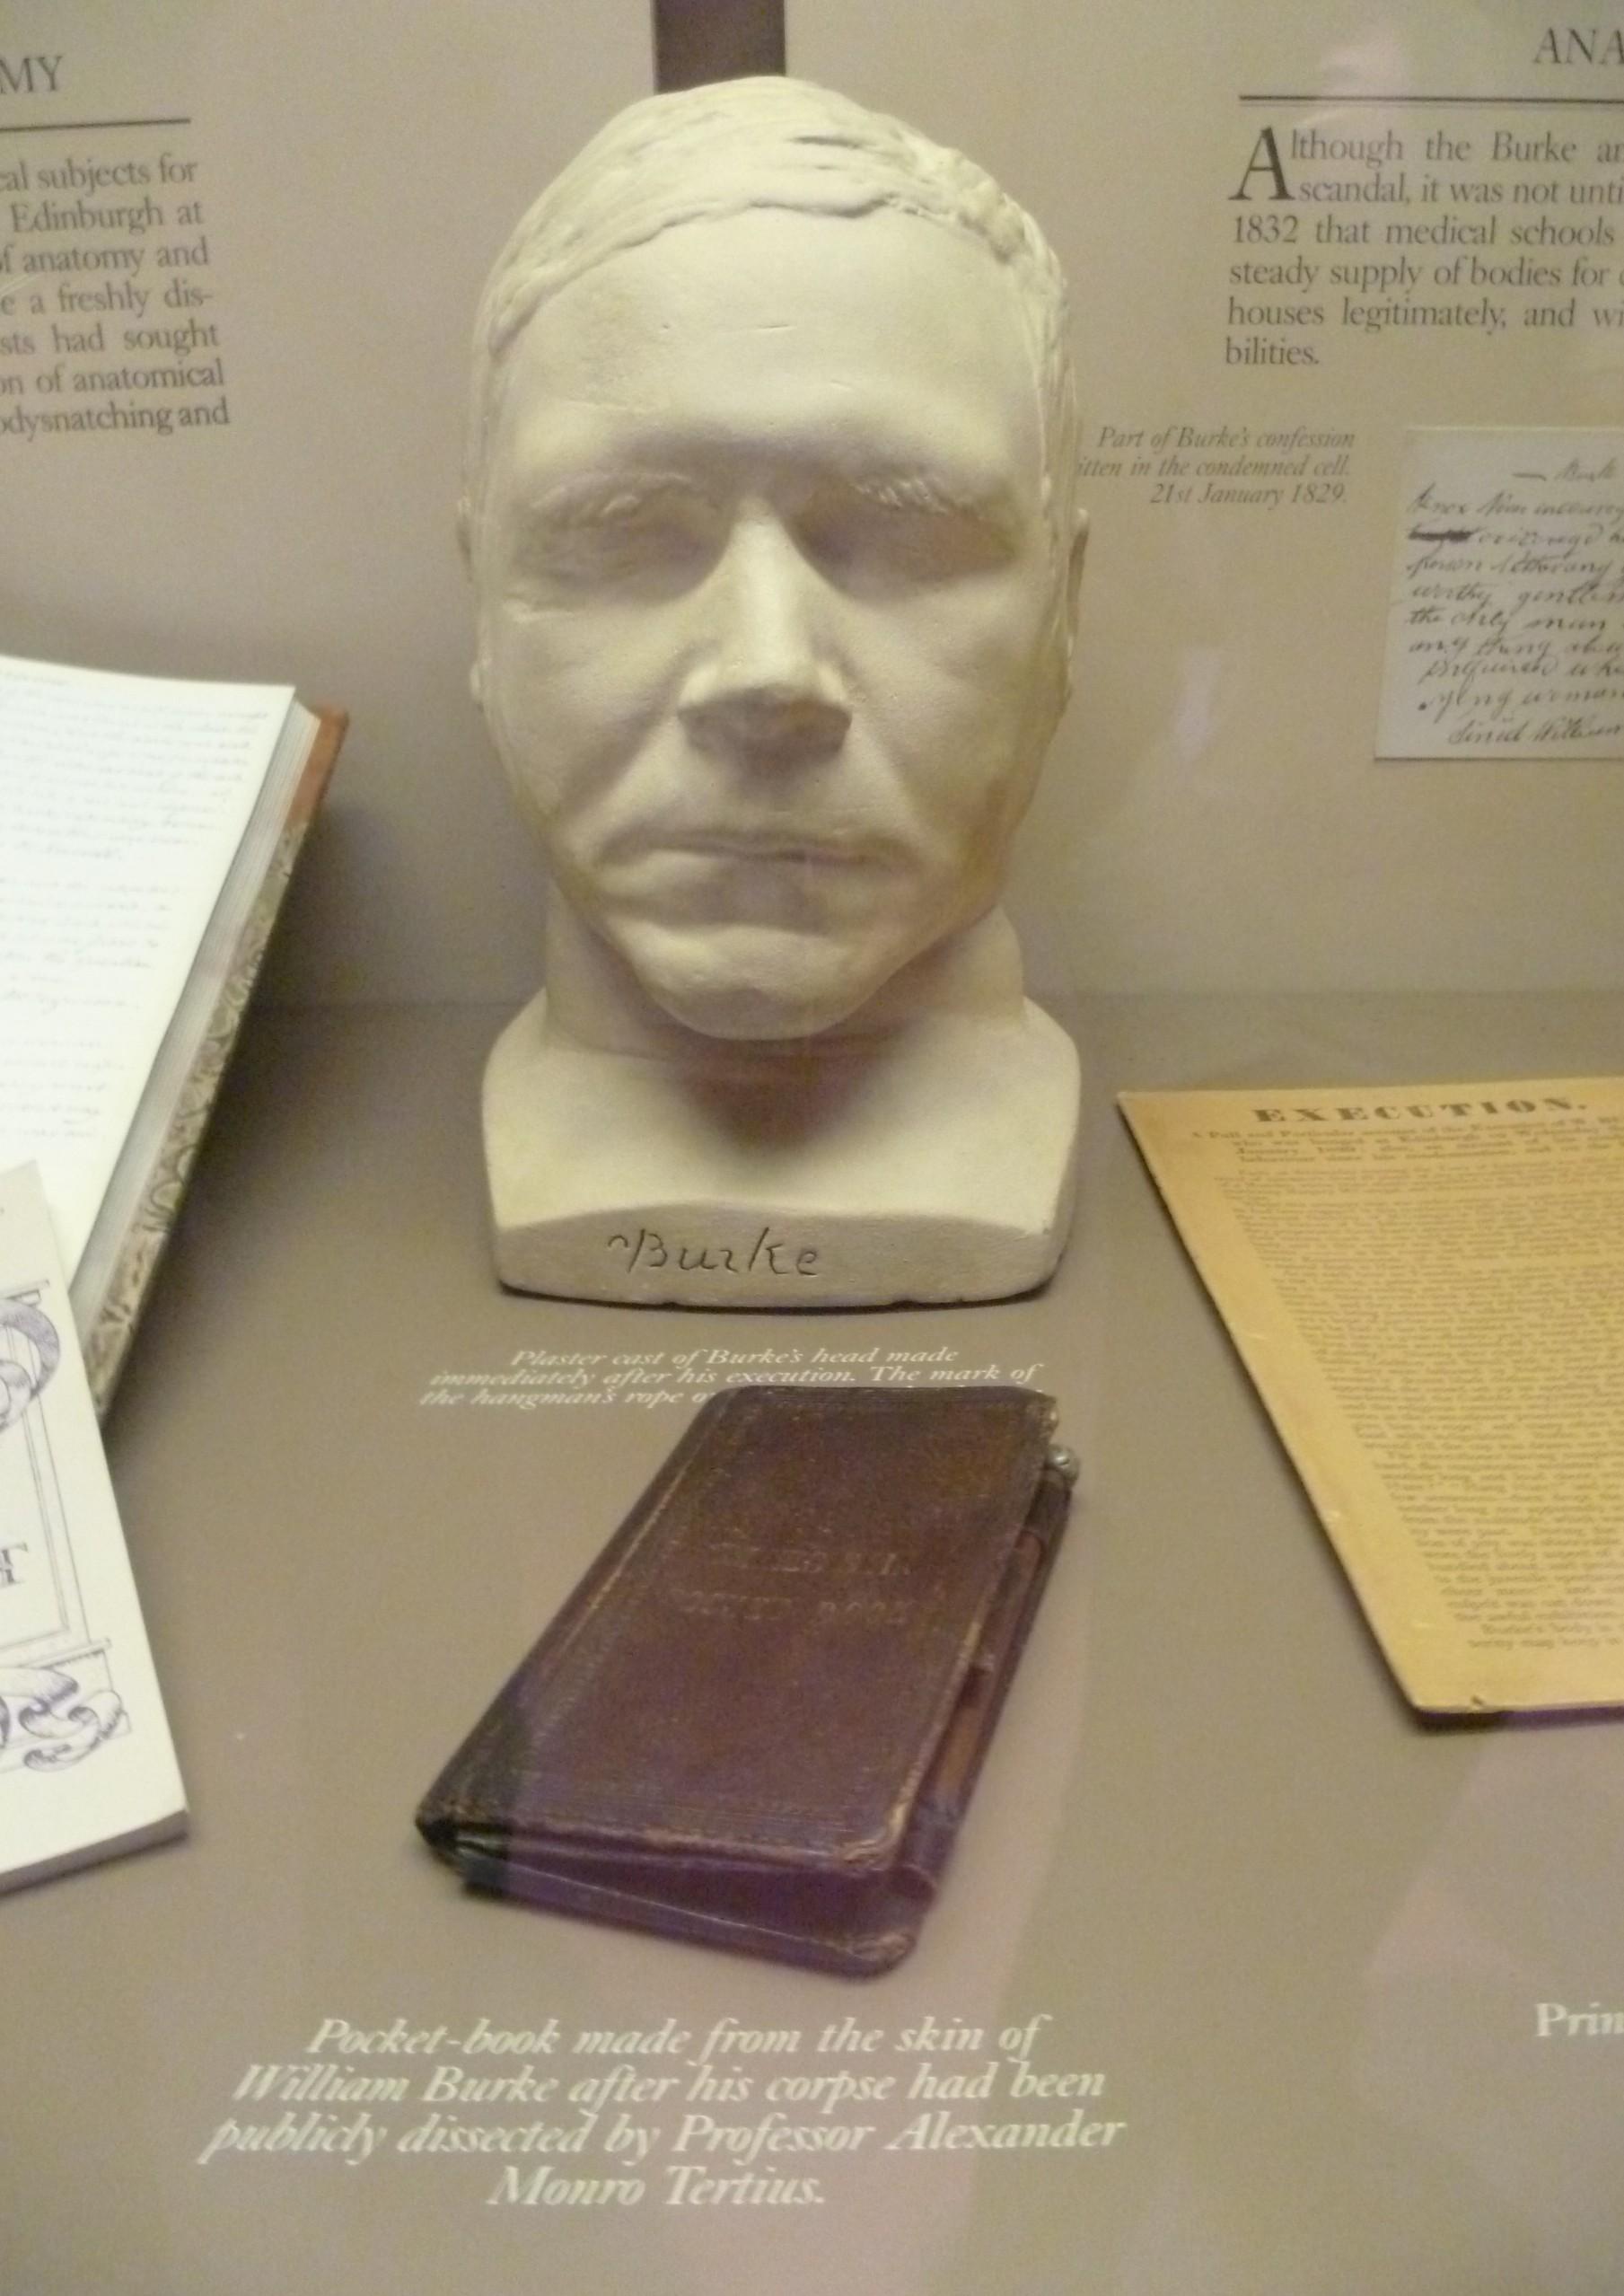 William Burke's death mask and pocket book, Surgeons' Hall Museum, Edinburgh.